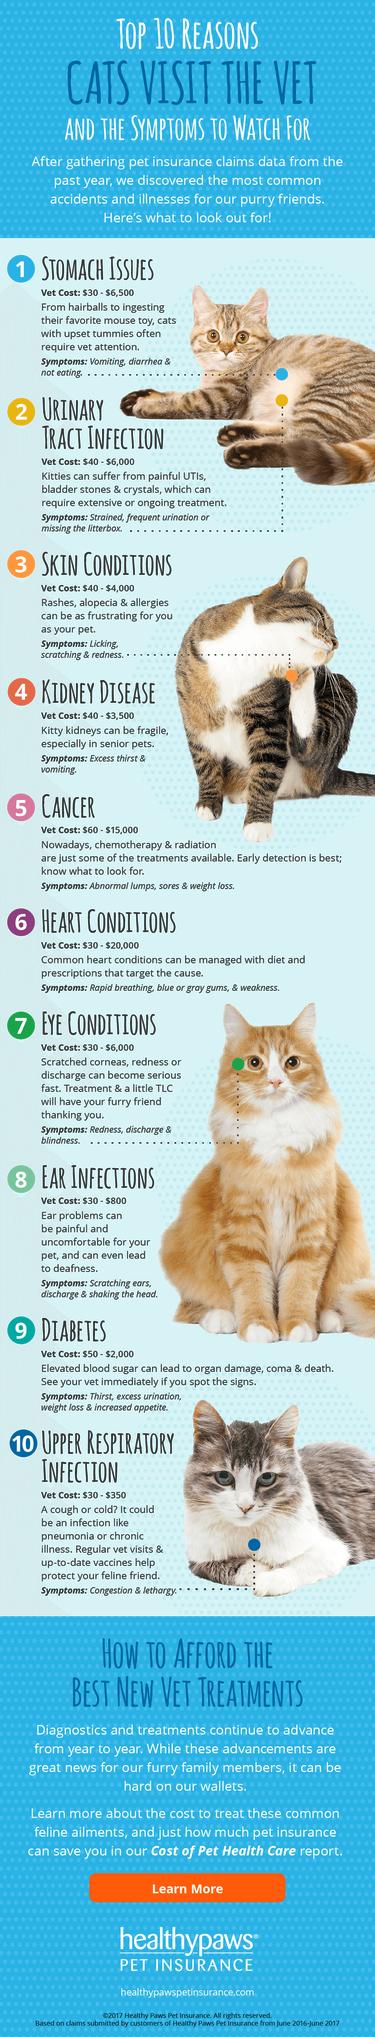 Top 10 Reasons Cats Visit The Vet